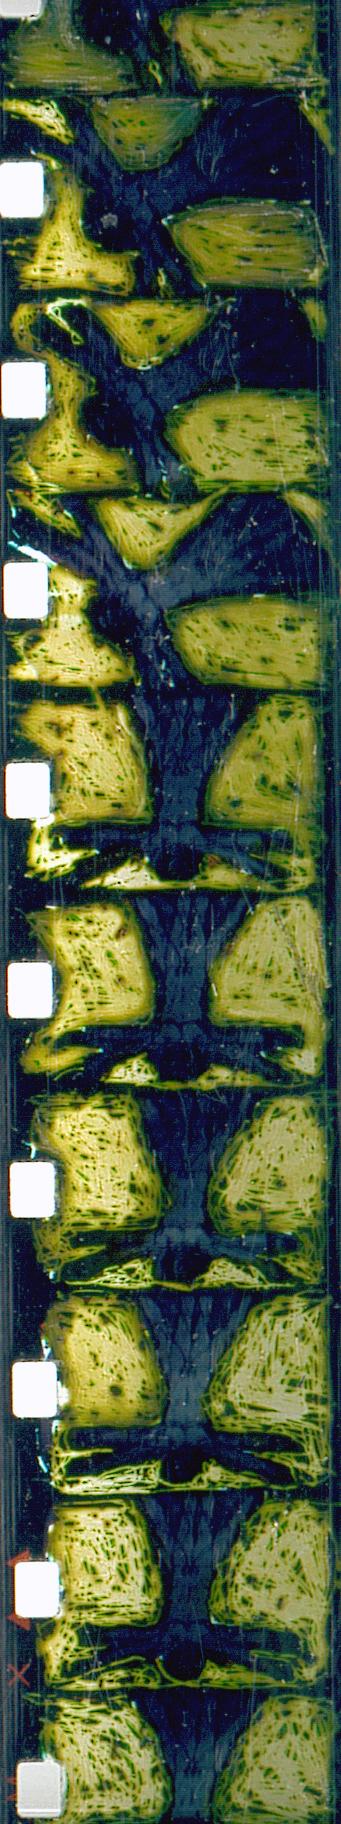 totalite-super-8-film-johanna-vaude-hand-painting_10